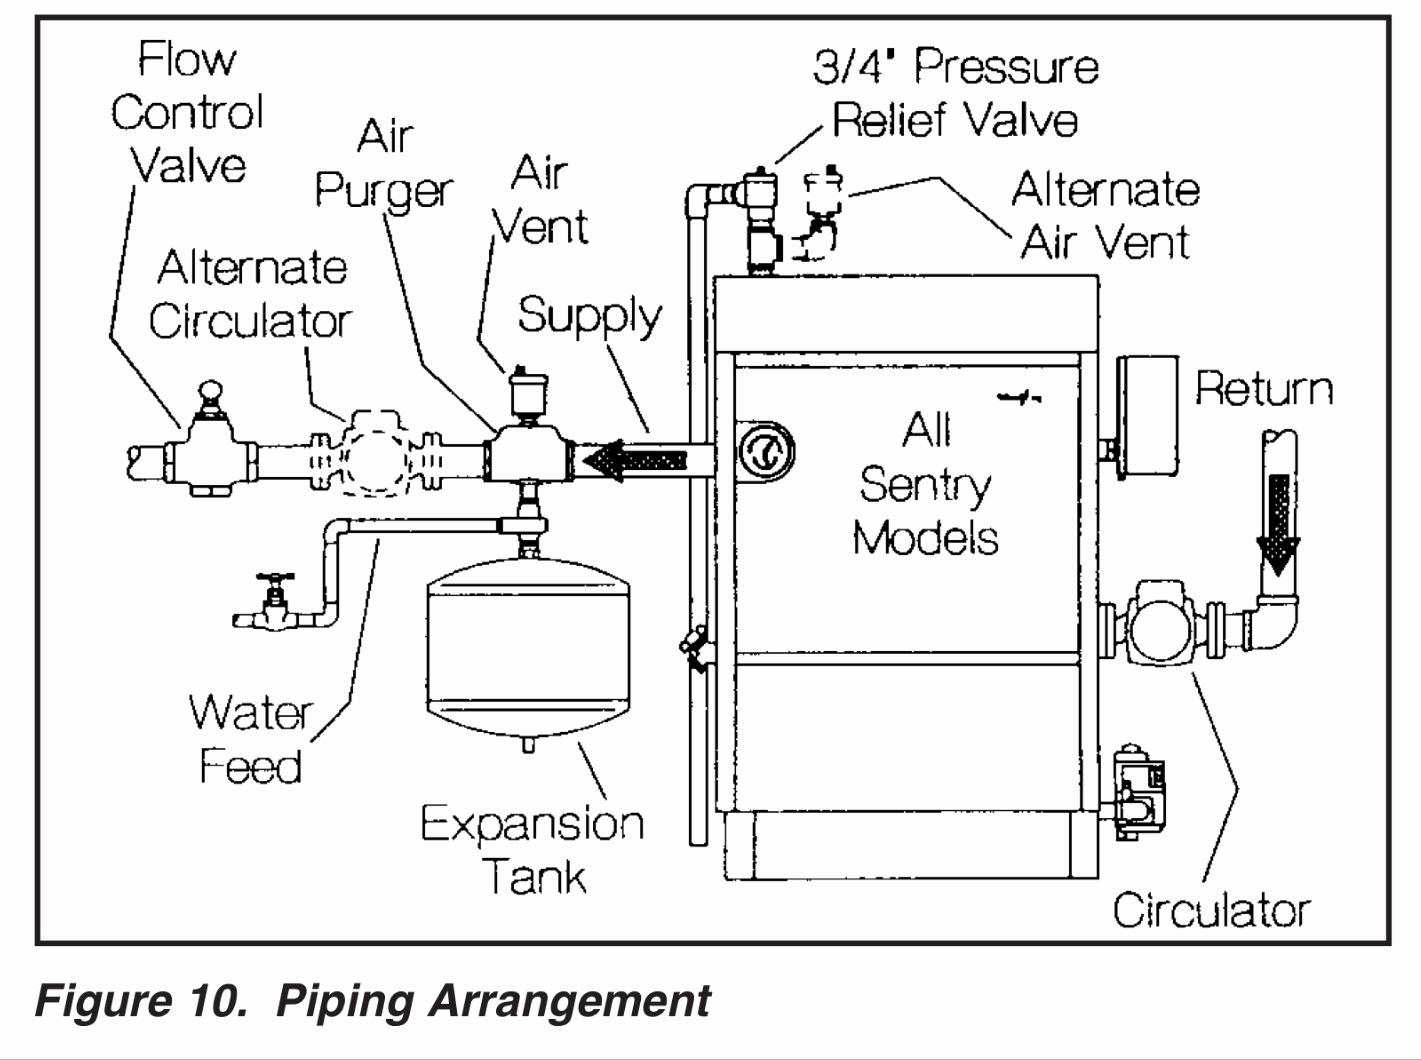 Taco Cartridge Circulator 007 F5 Wiring Diagram Collection